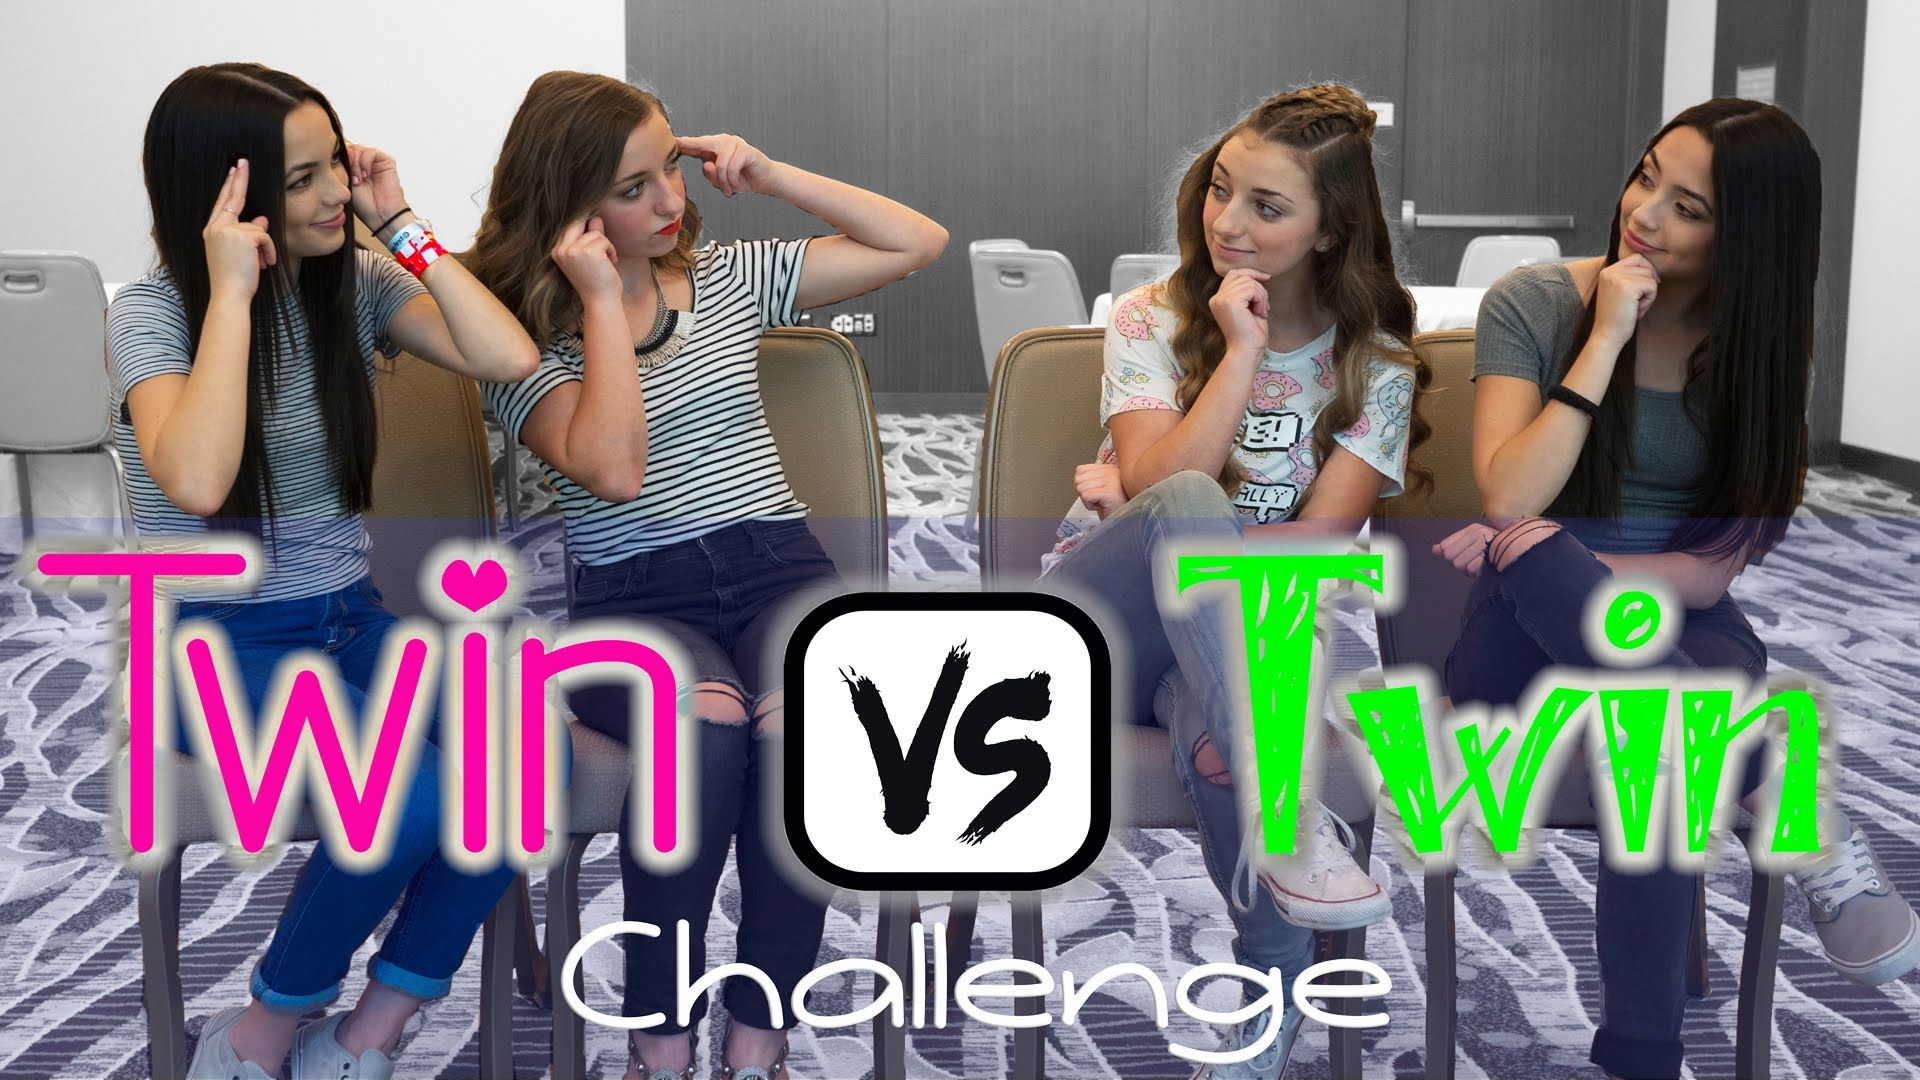 Twin vs Twin Challenge | ft. the MerrellTwins